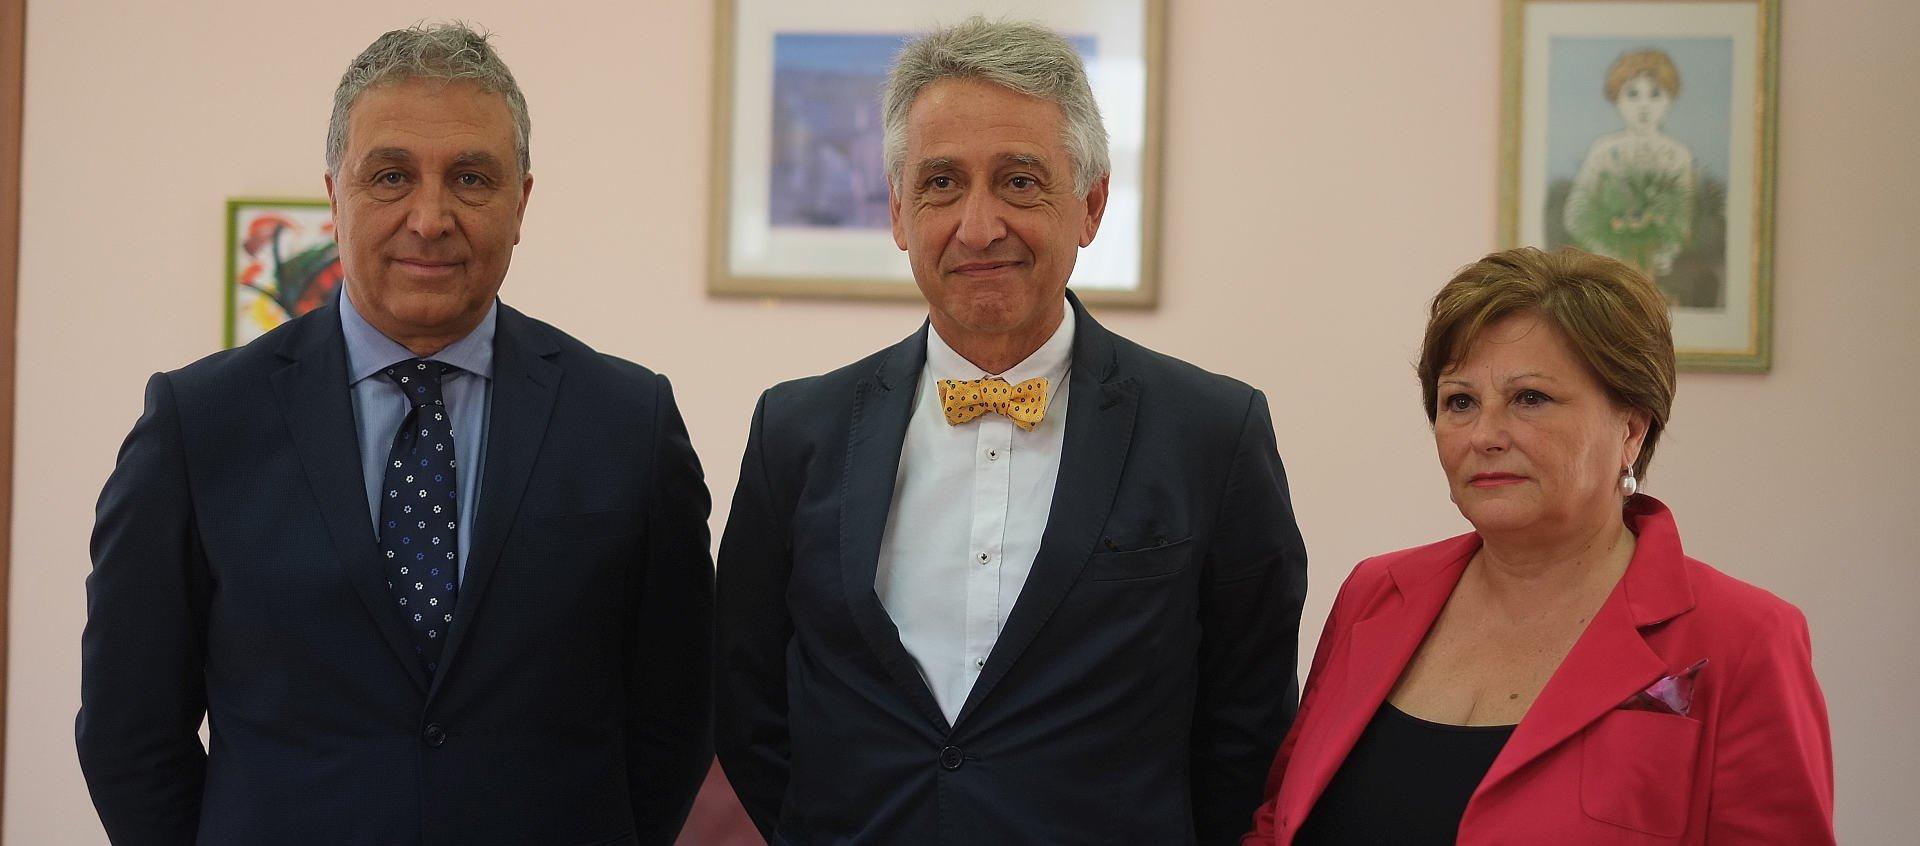 Pietro Greco, Maurizio Aricò e Nora Virga